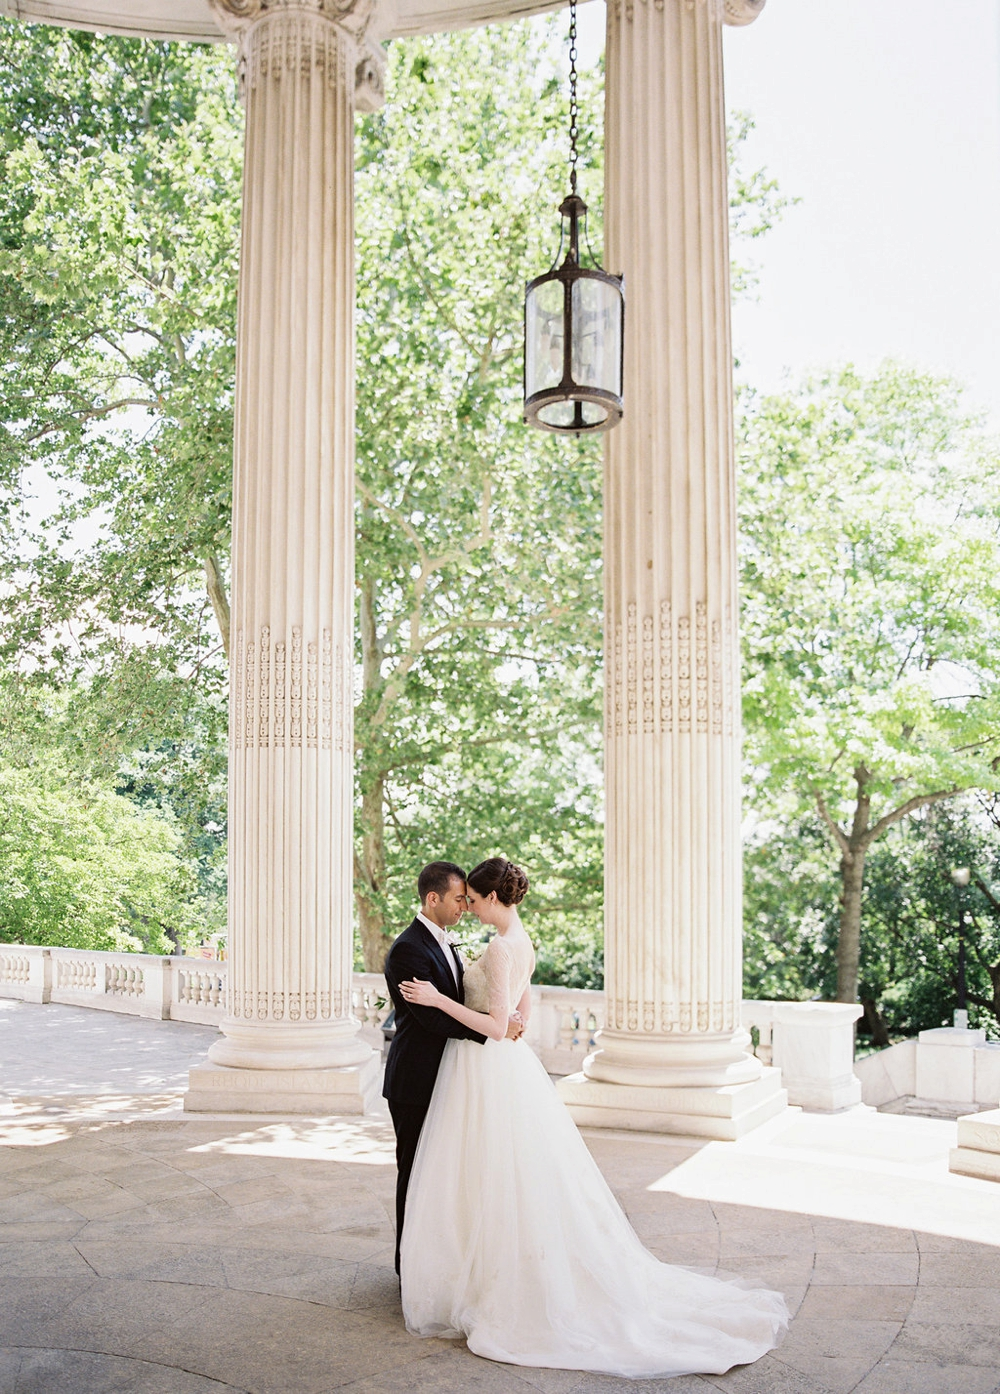 Vicki Grafton Photography - Fine Art DC Virginia Charlottesville Film Wedding Photographer_0028.jpg